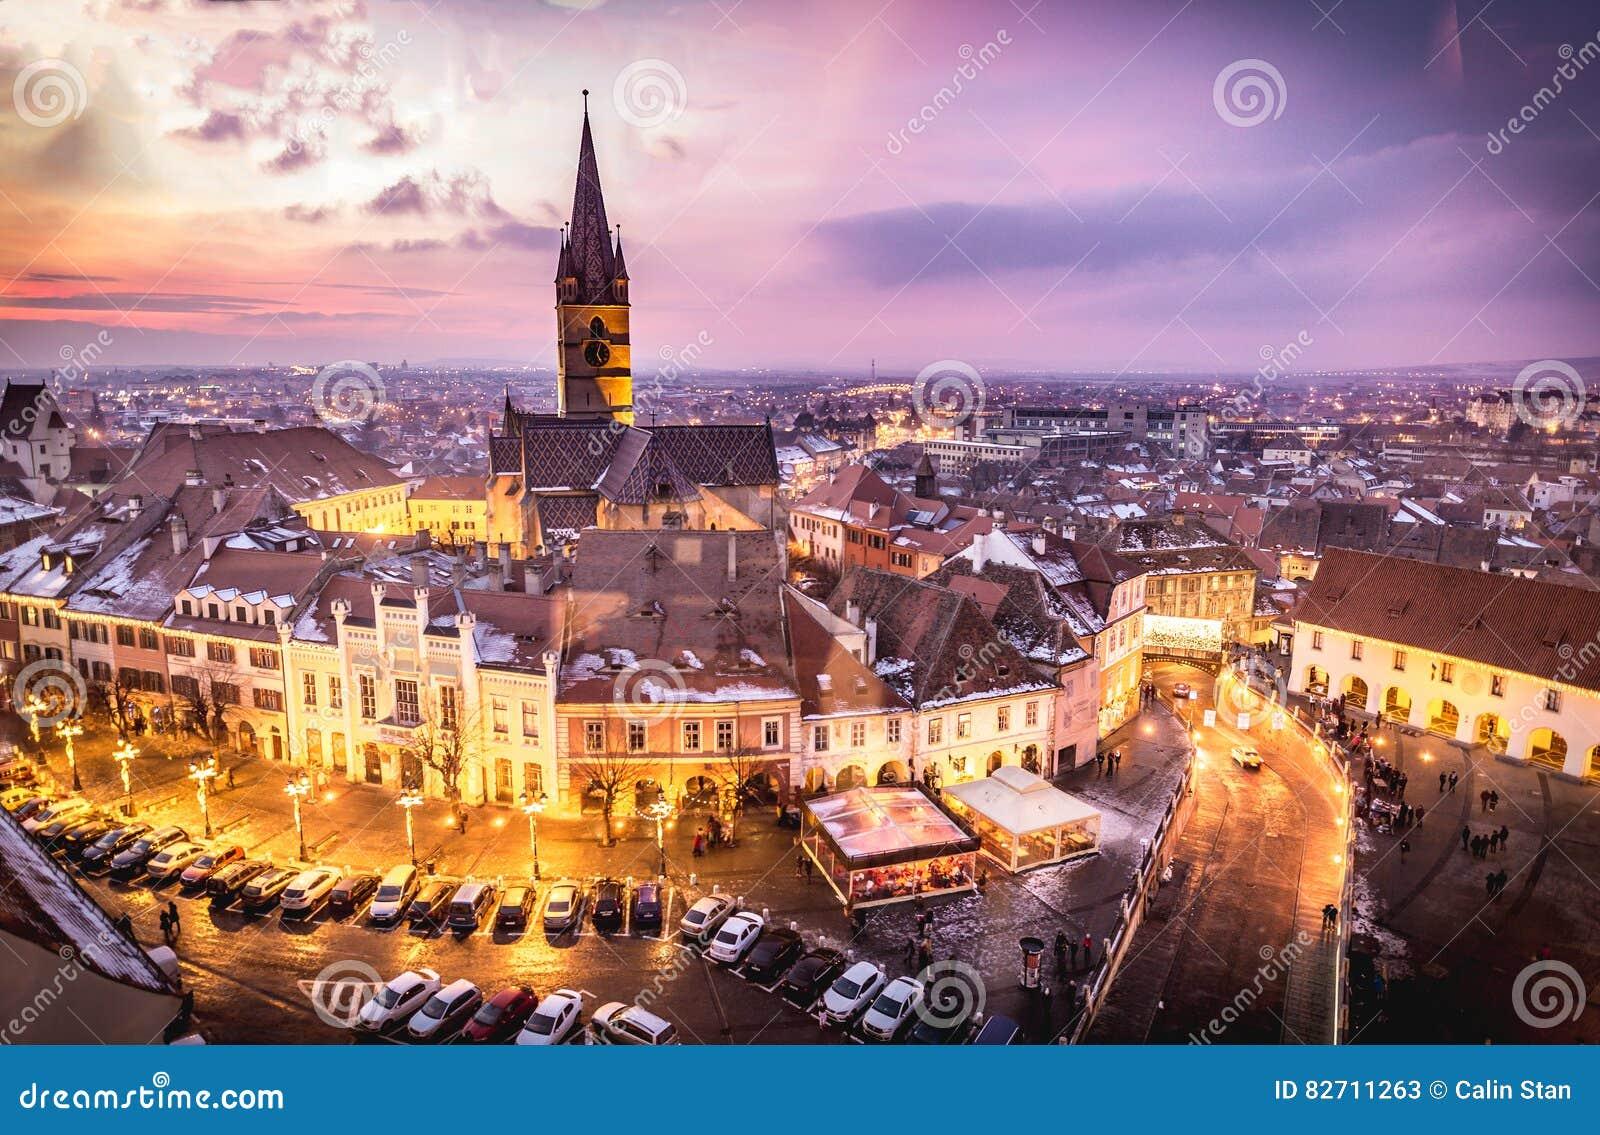 Sibiu, Transylvania, Romania central square at sunset